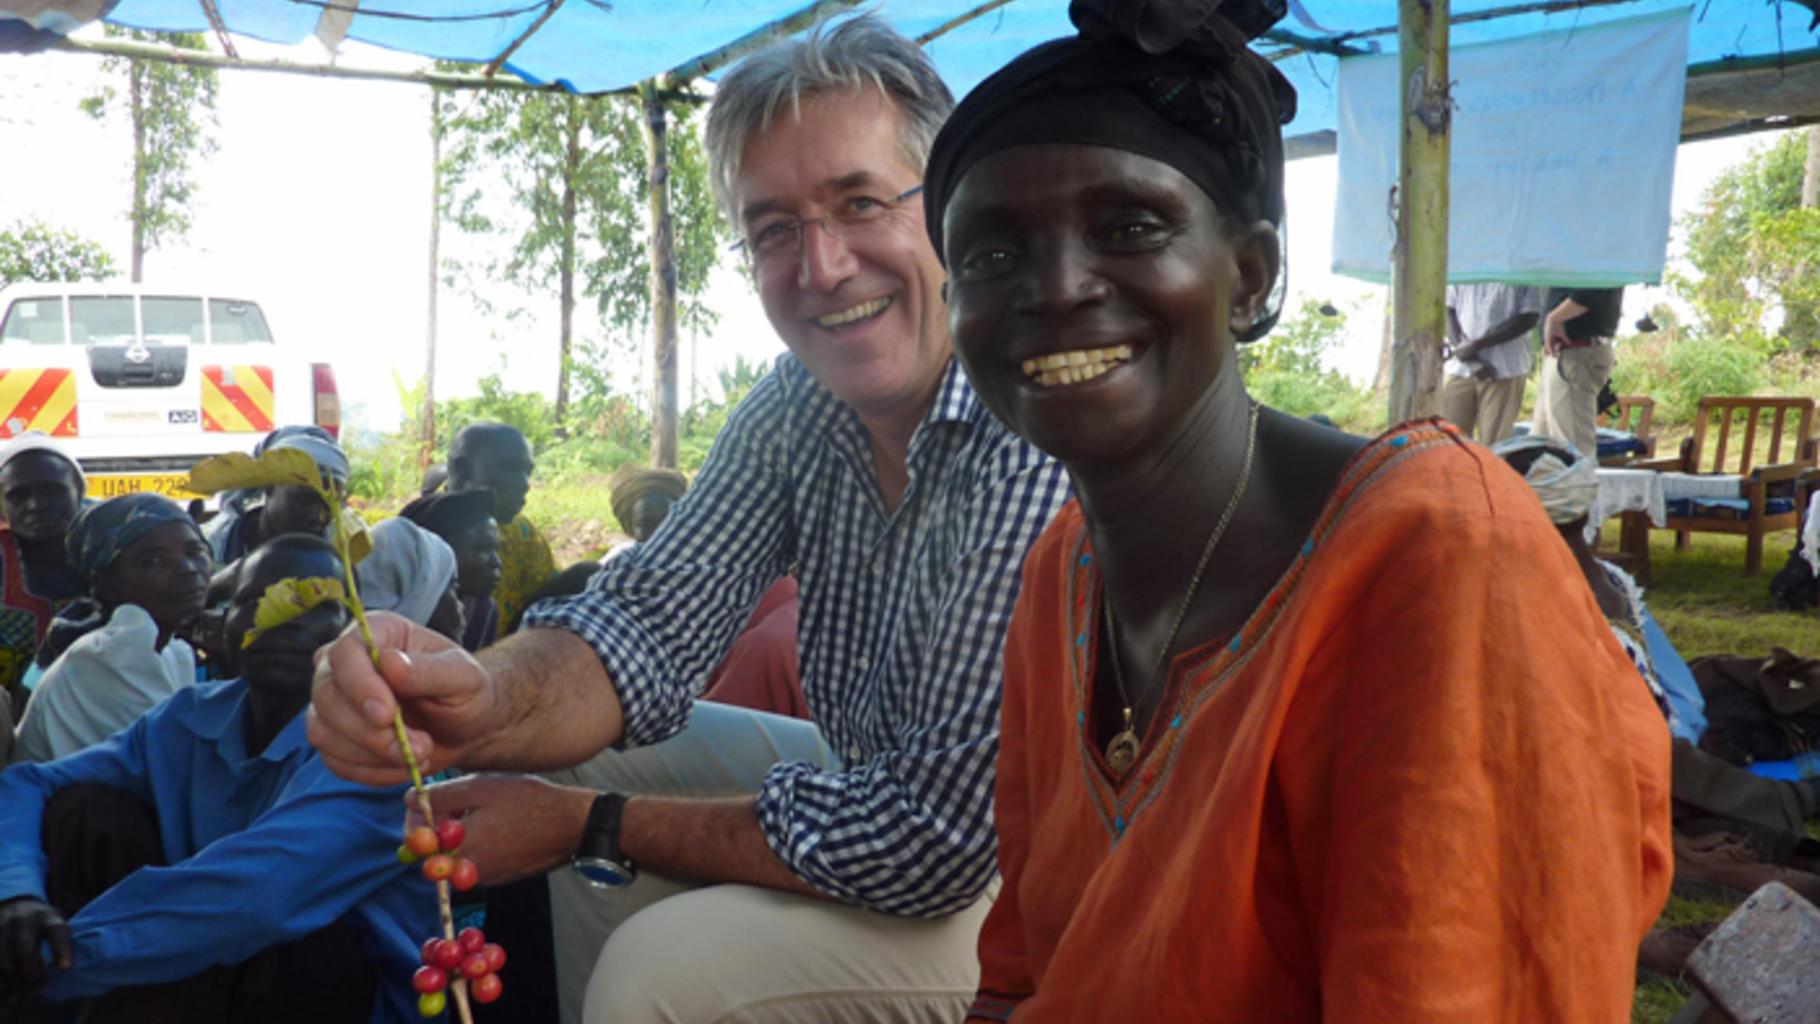 Paul Smeets und Jeanet Ozinga lachen gemeinsam